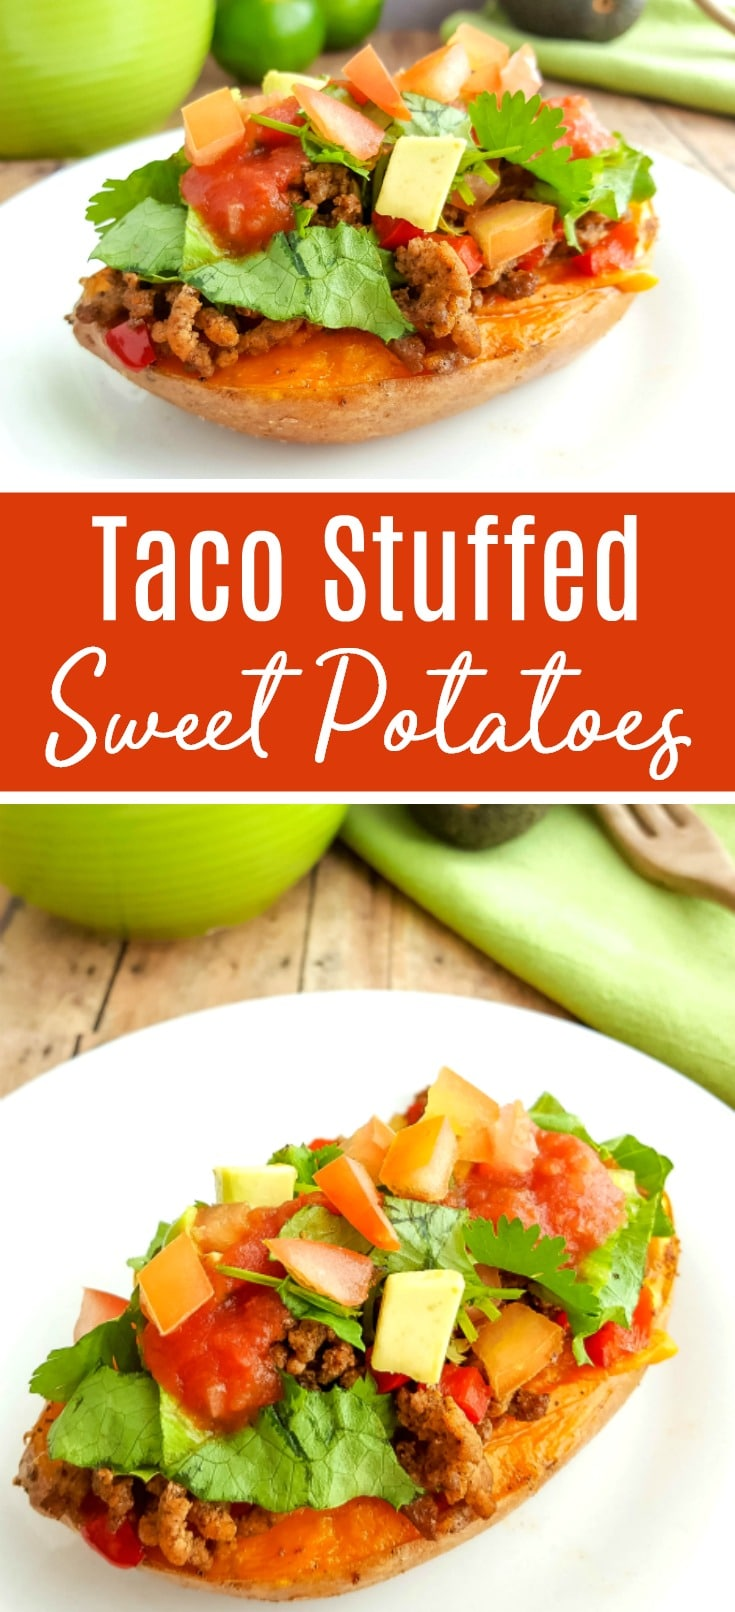 Taco Stuffed Sweet Potatoes Recipe | Whole30 Taco Sweet Potato